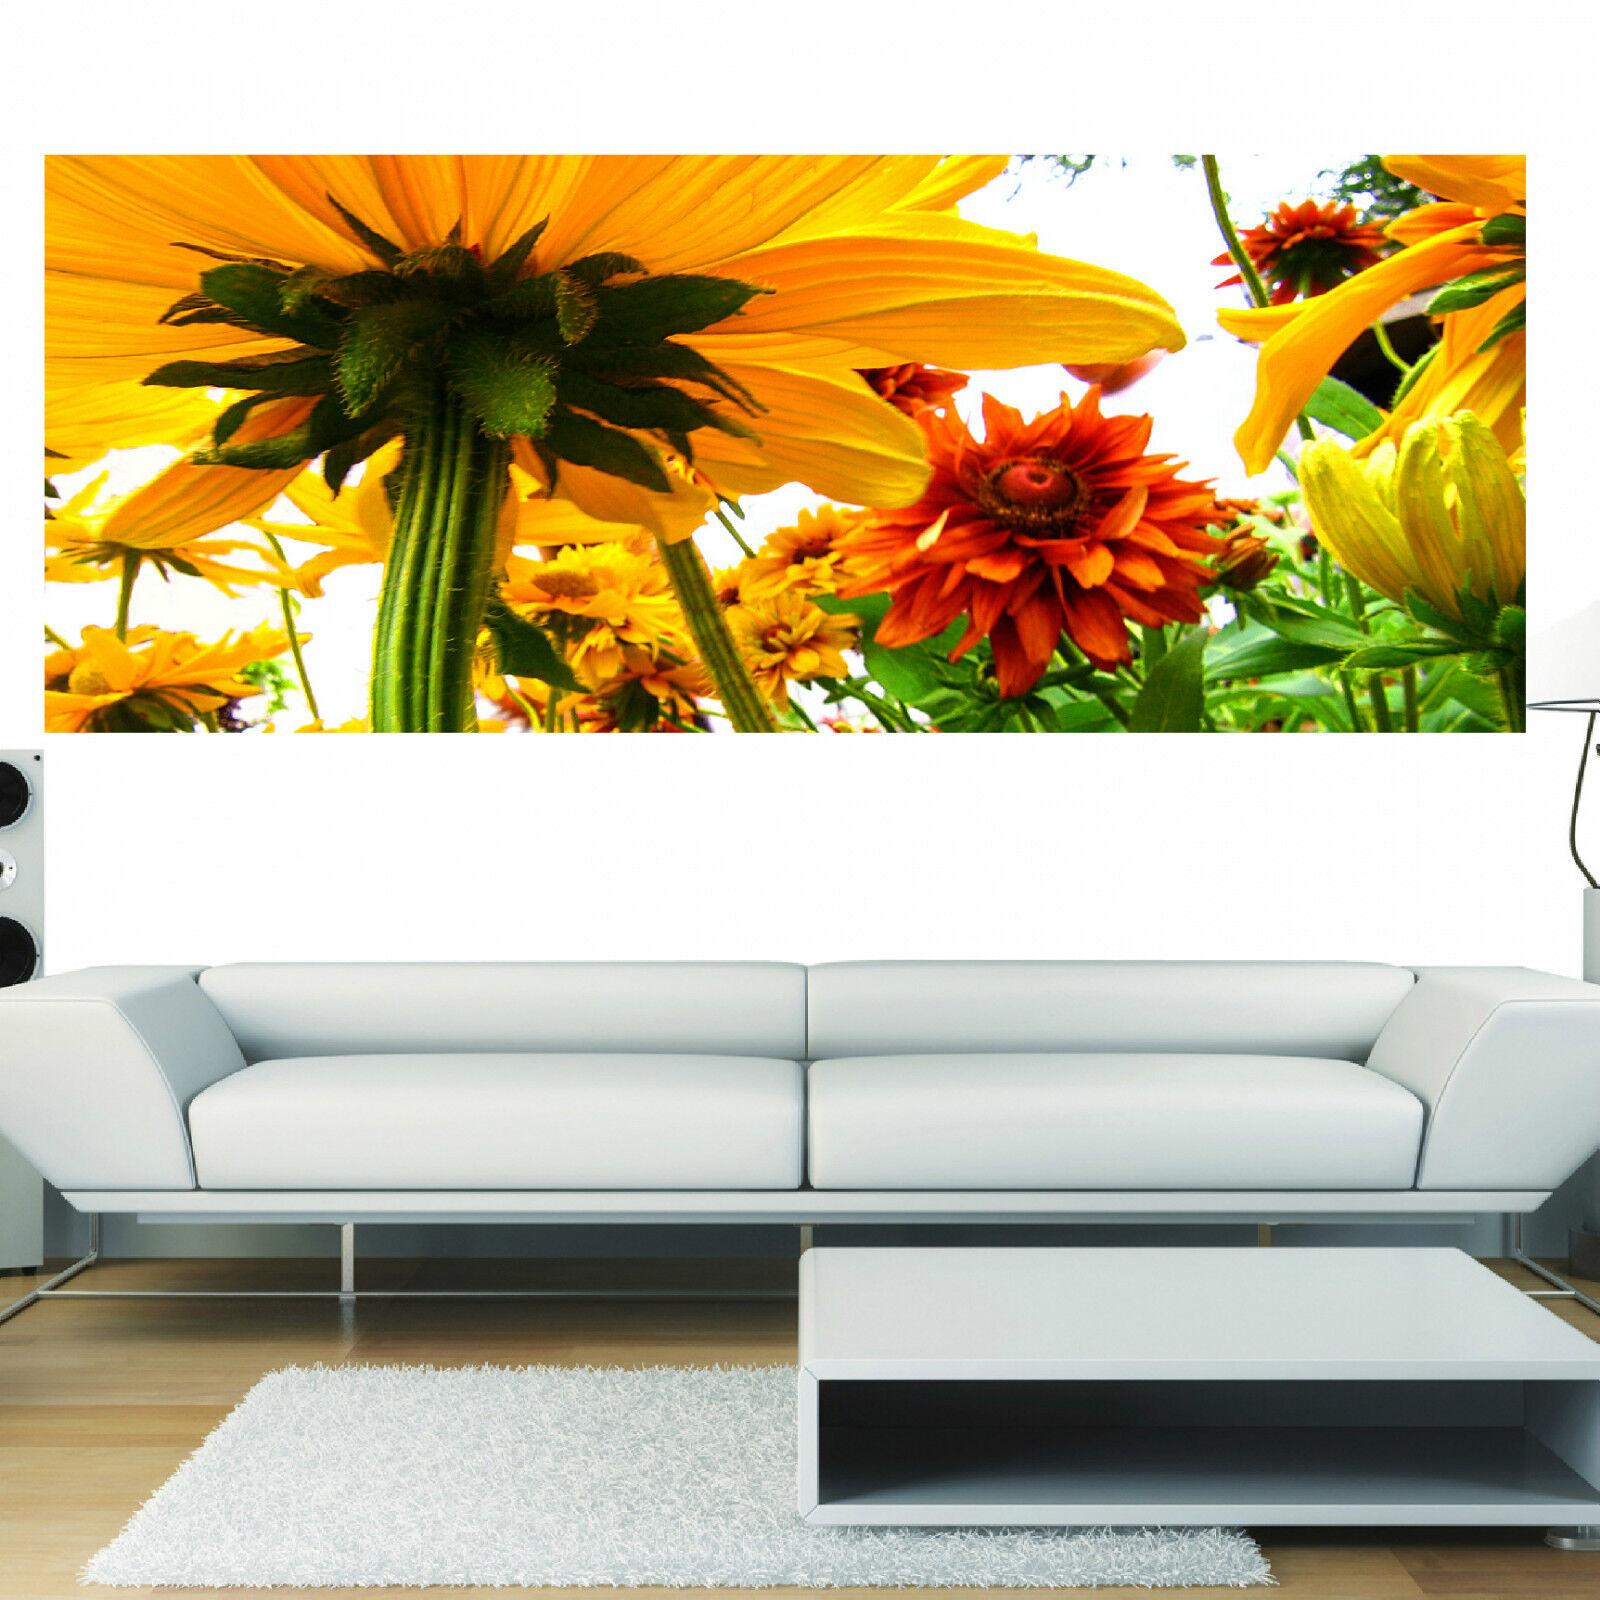 Aufkleber Panorama Deko Sonnenbluemen Ref 3643 (13 Größe)